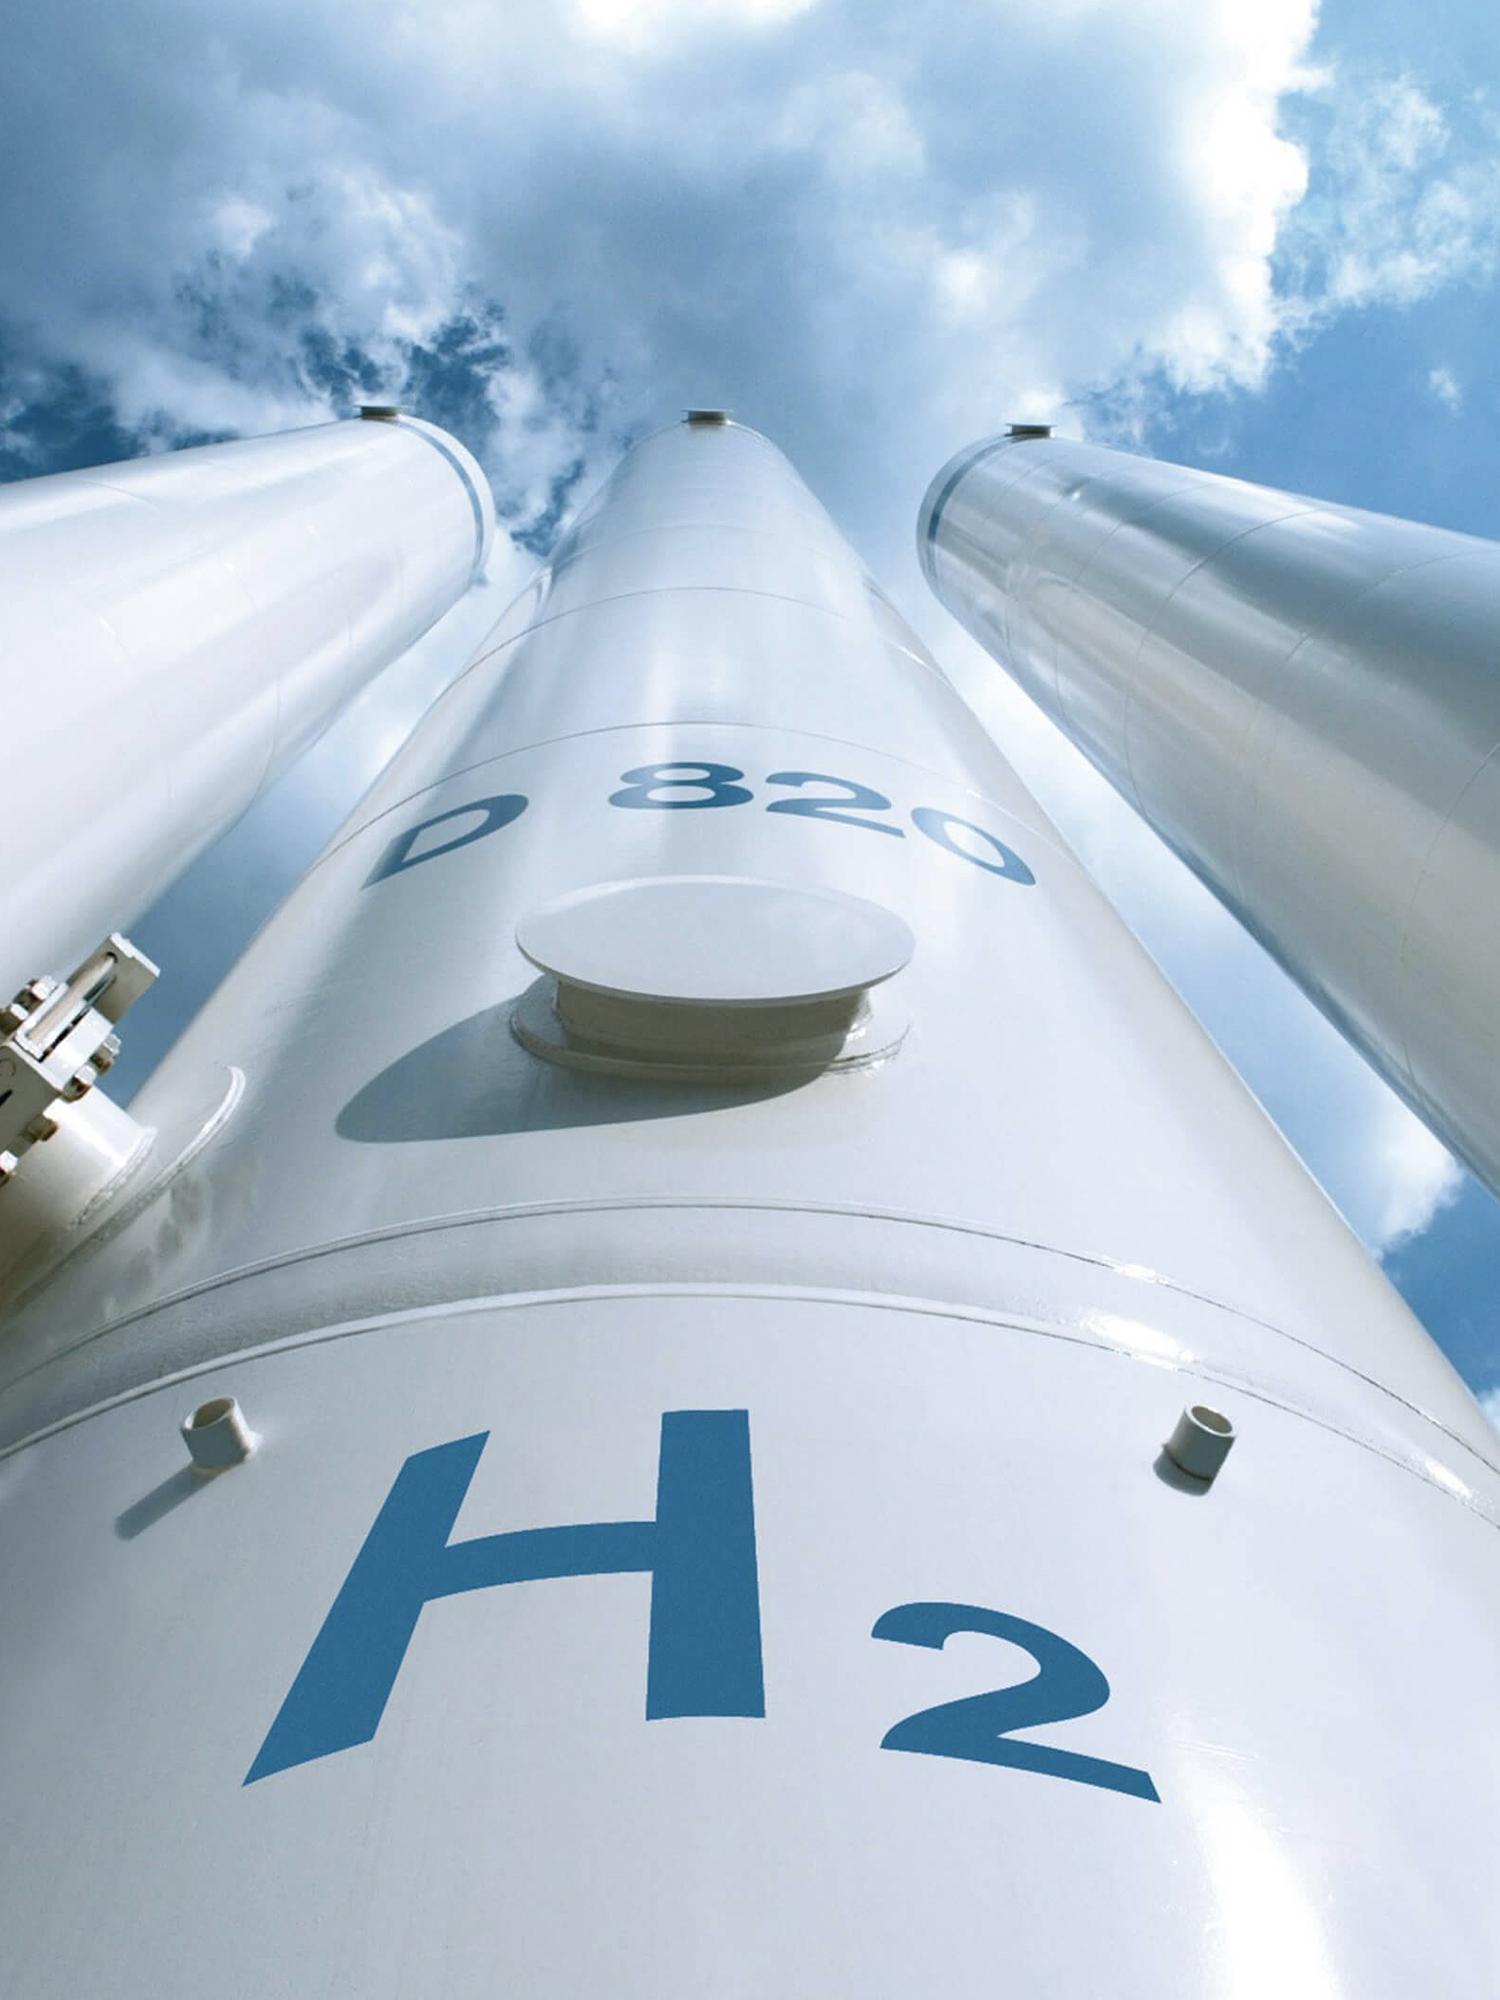 https://universalkraft.com/wp-content/uploads/2020/11/hydrogen-service-02-universal-kraft.jpg